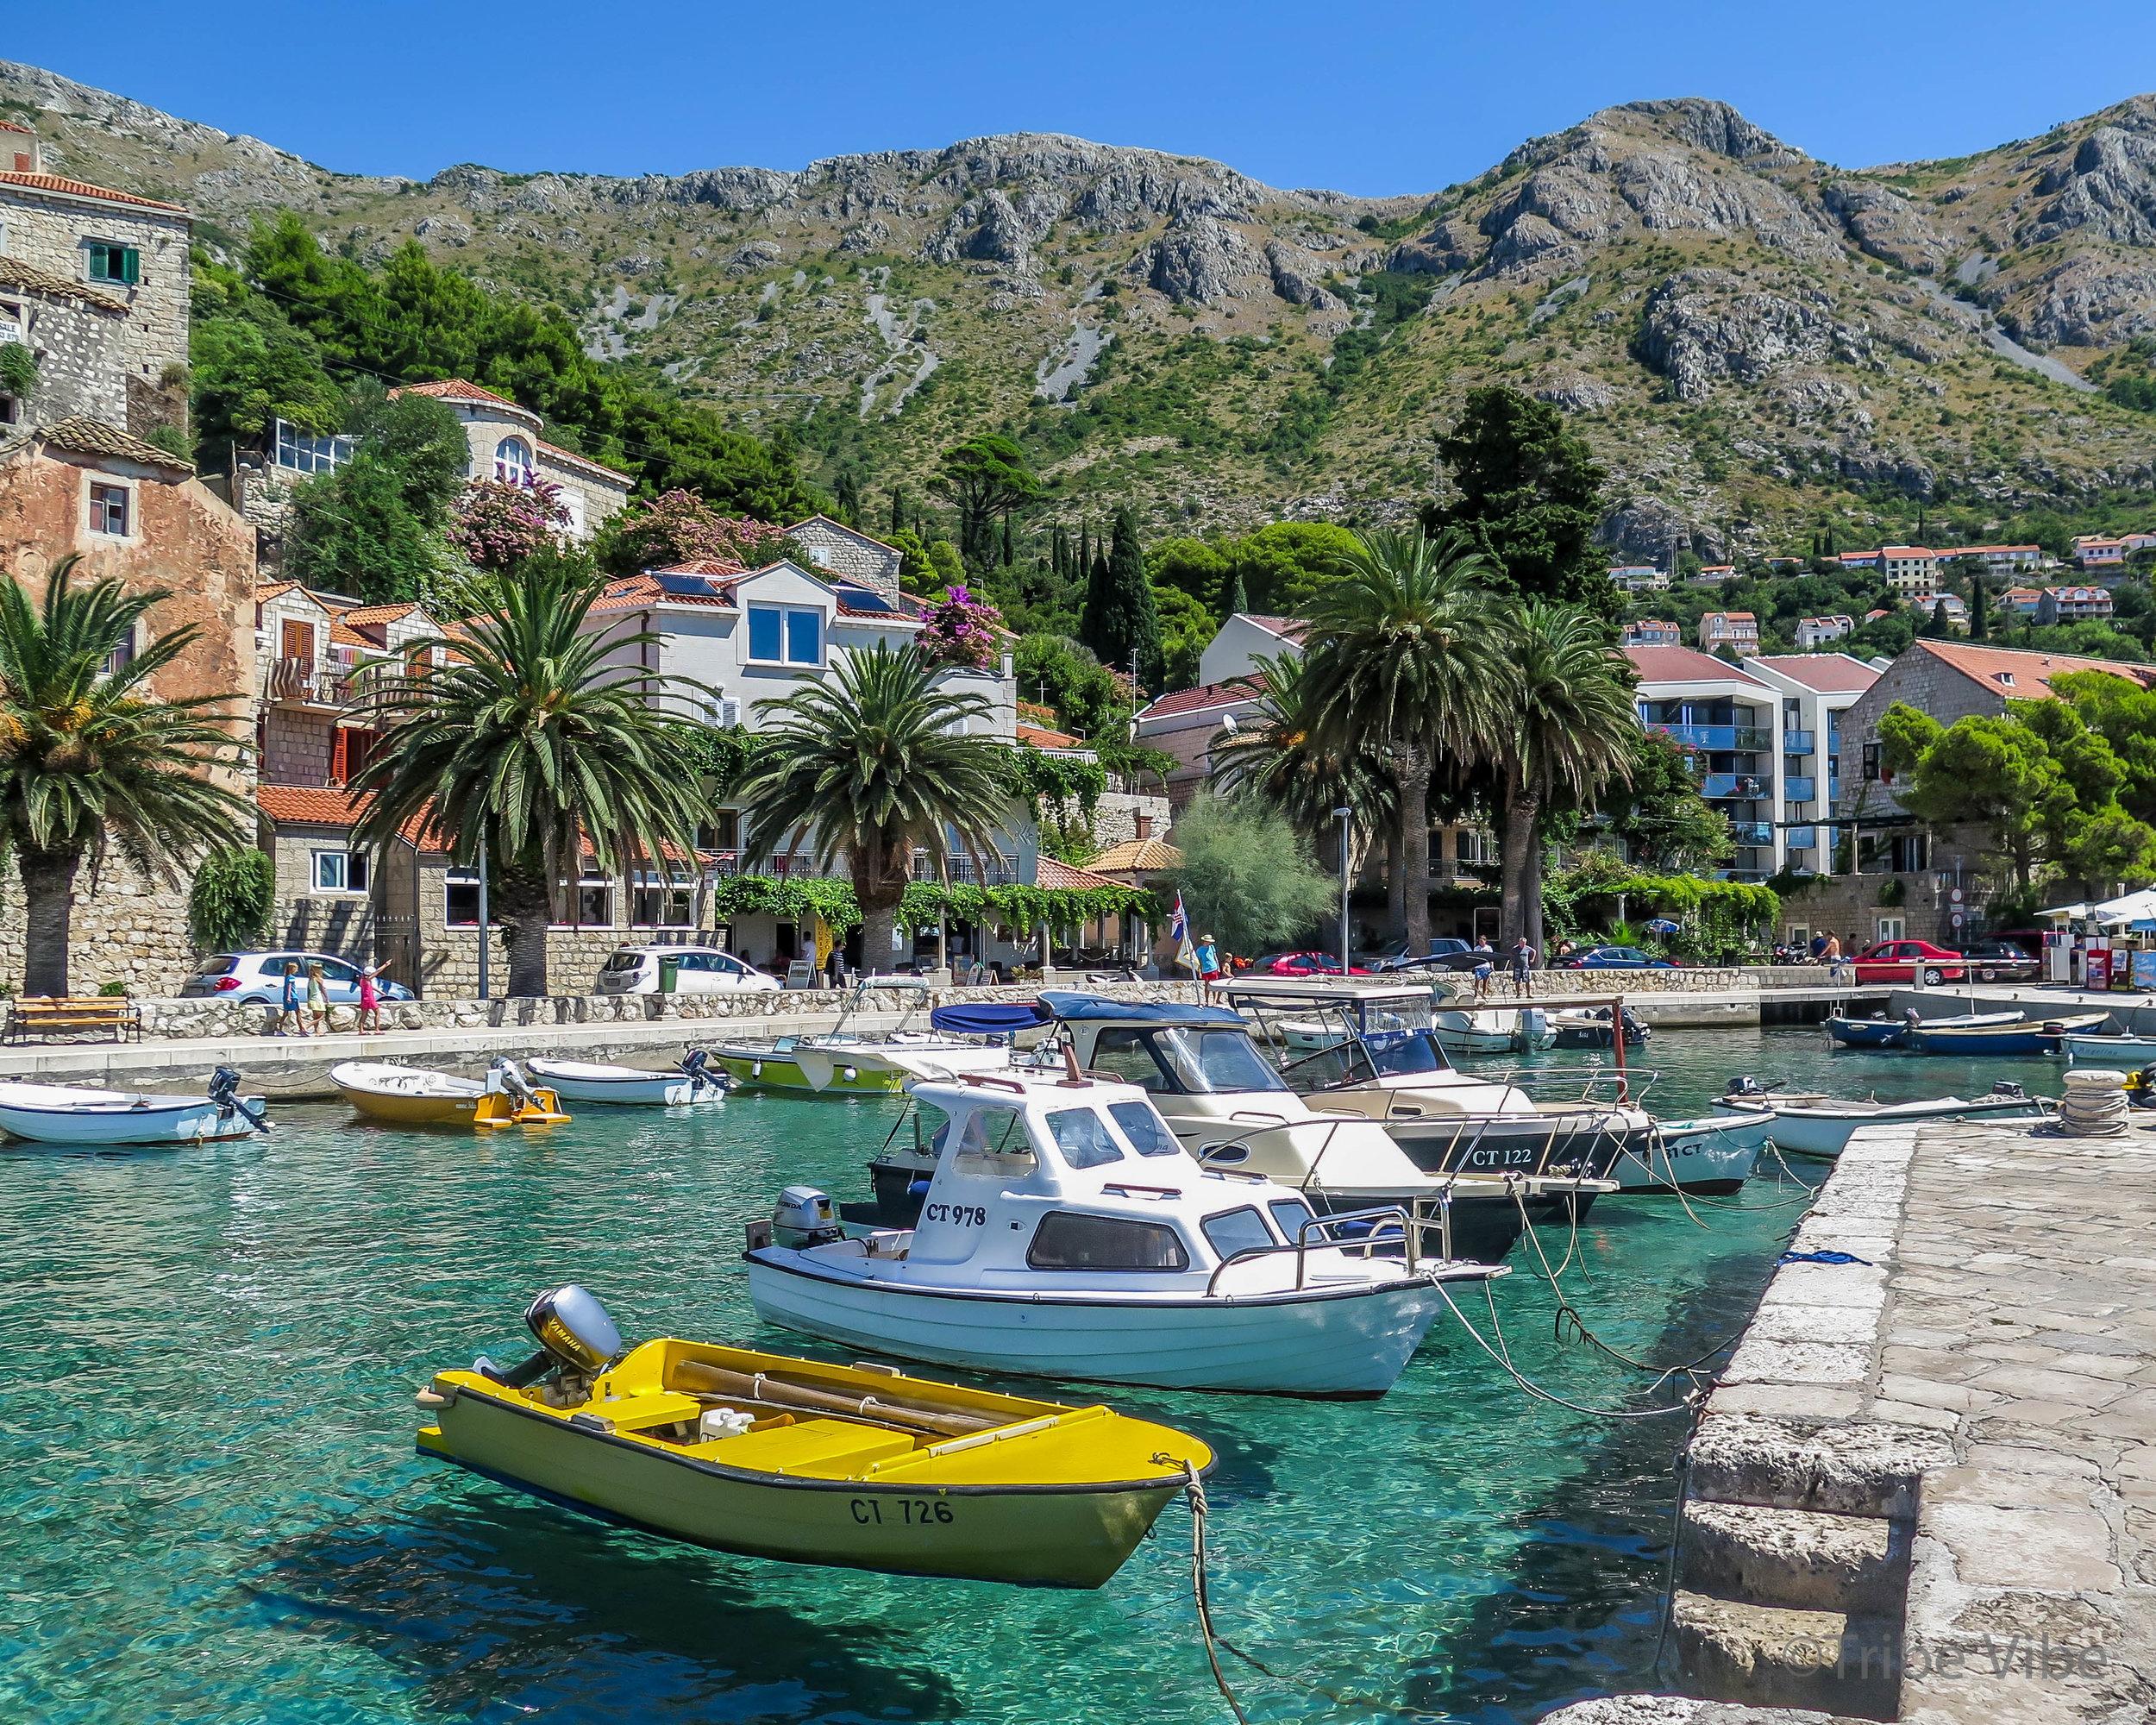 Croatia Road trip. Delightful Mlini, Croatia